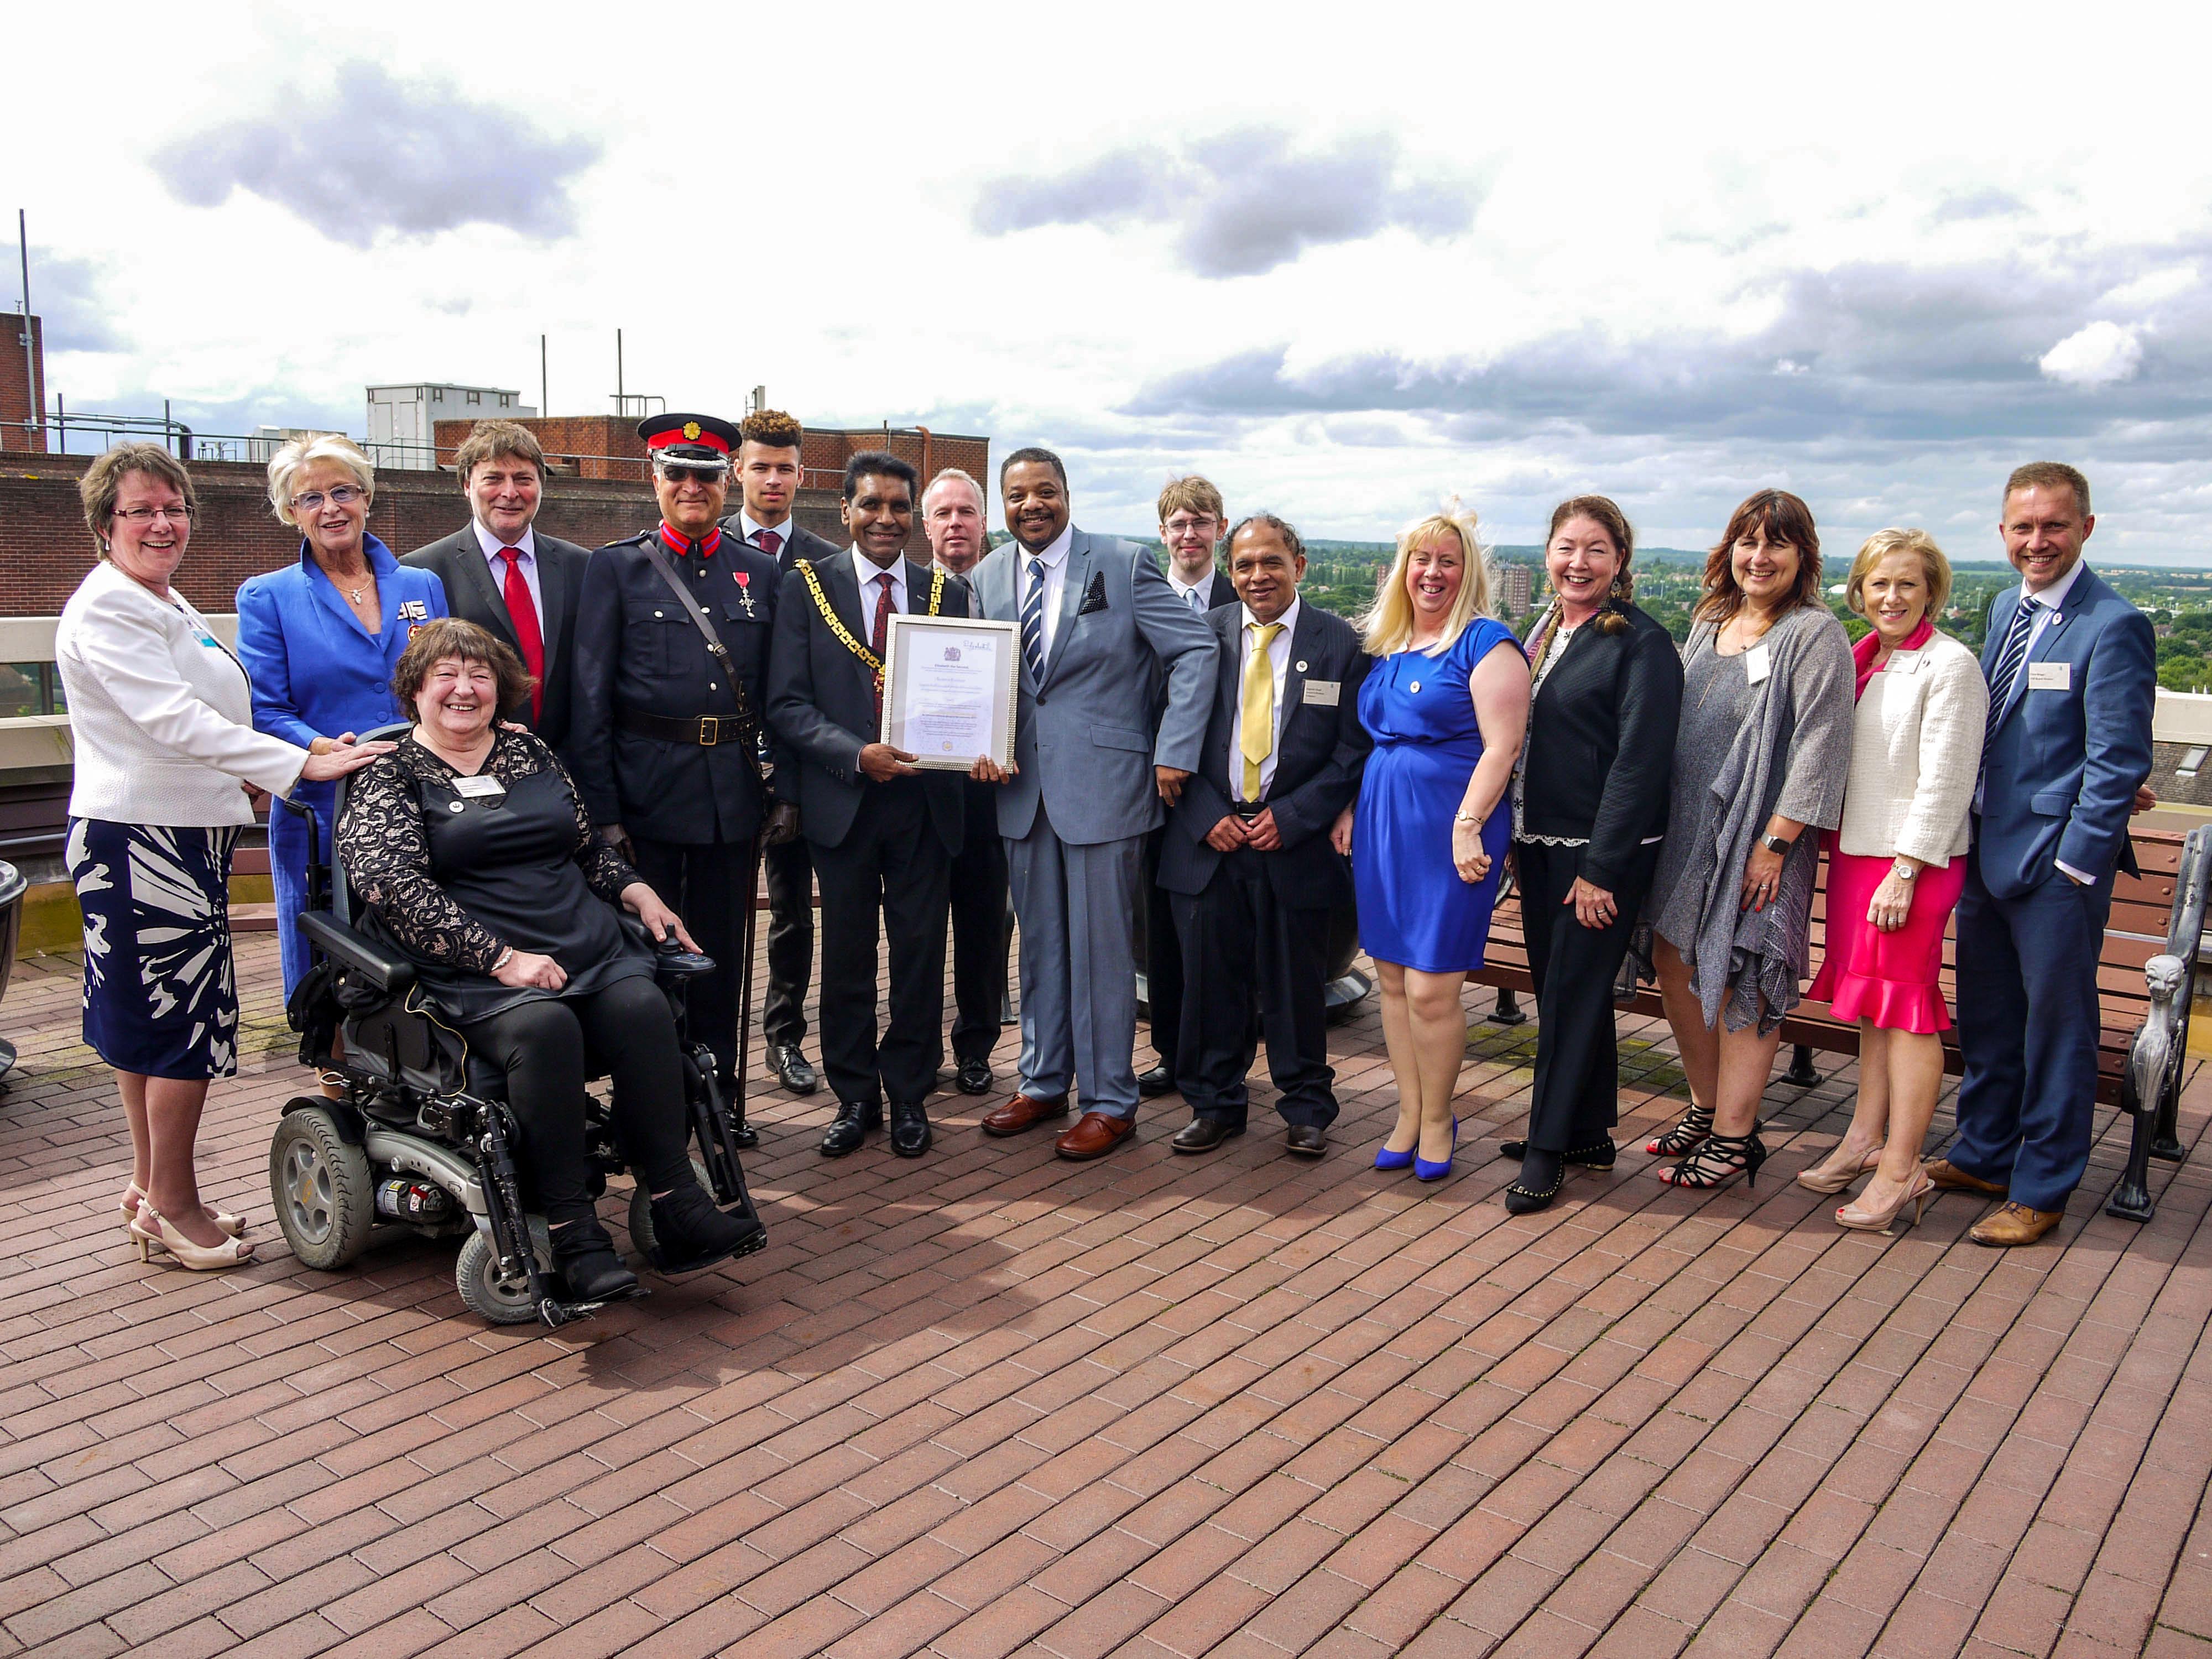 Queen, Voluntary Service, employment, skills, confidence, mayor, Wolverhampton Council, Wolverhampton